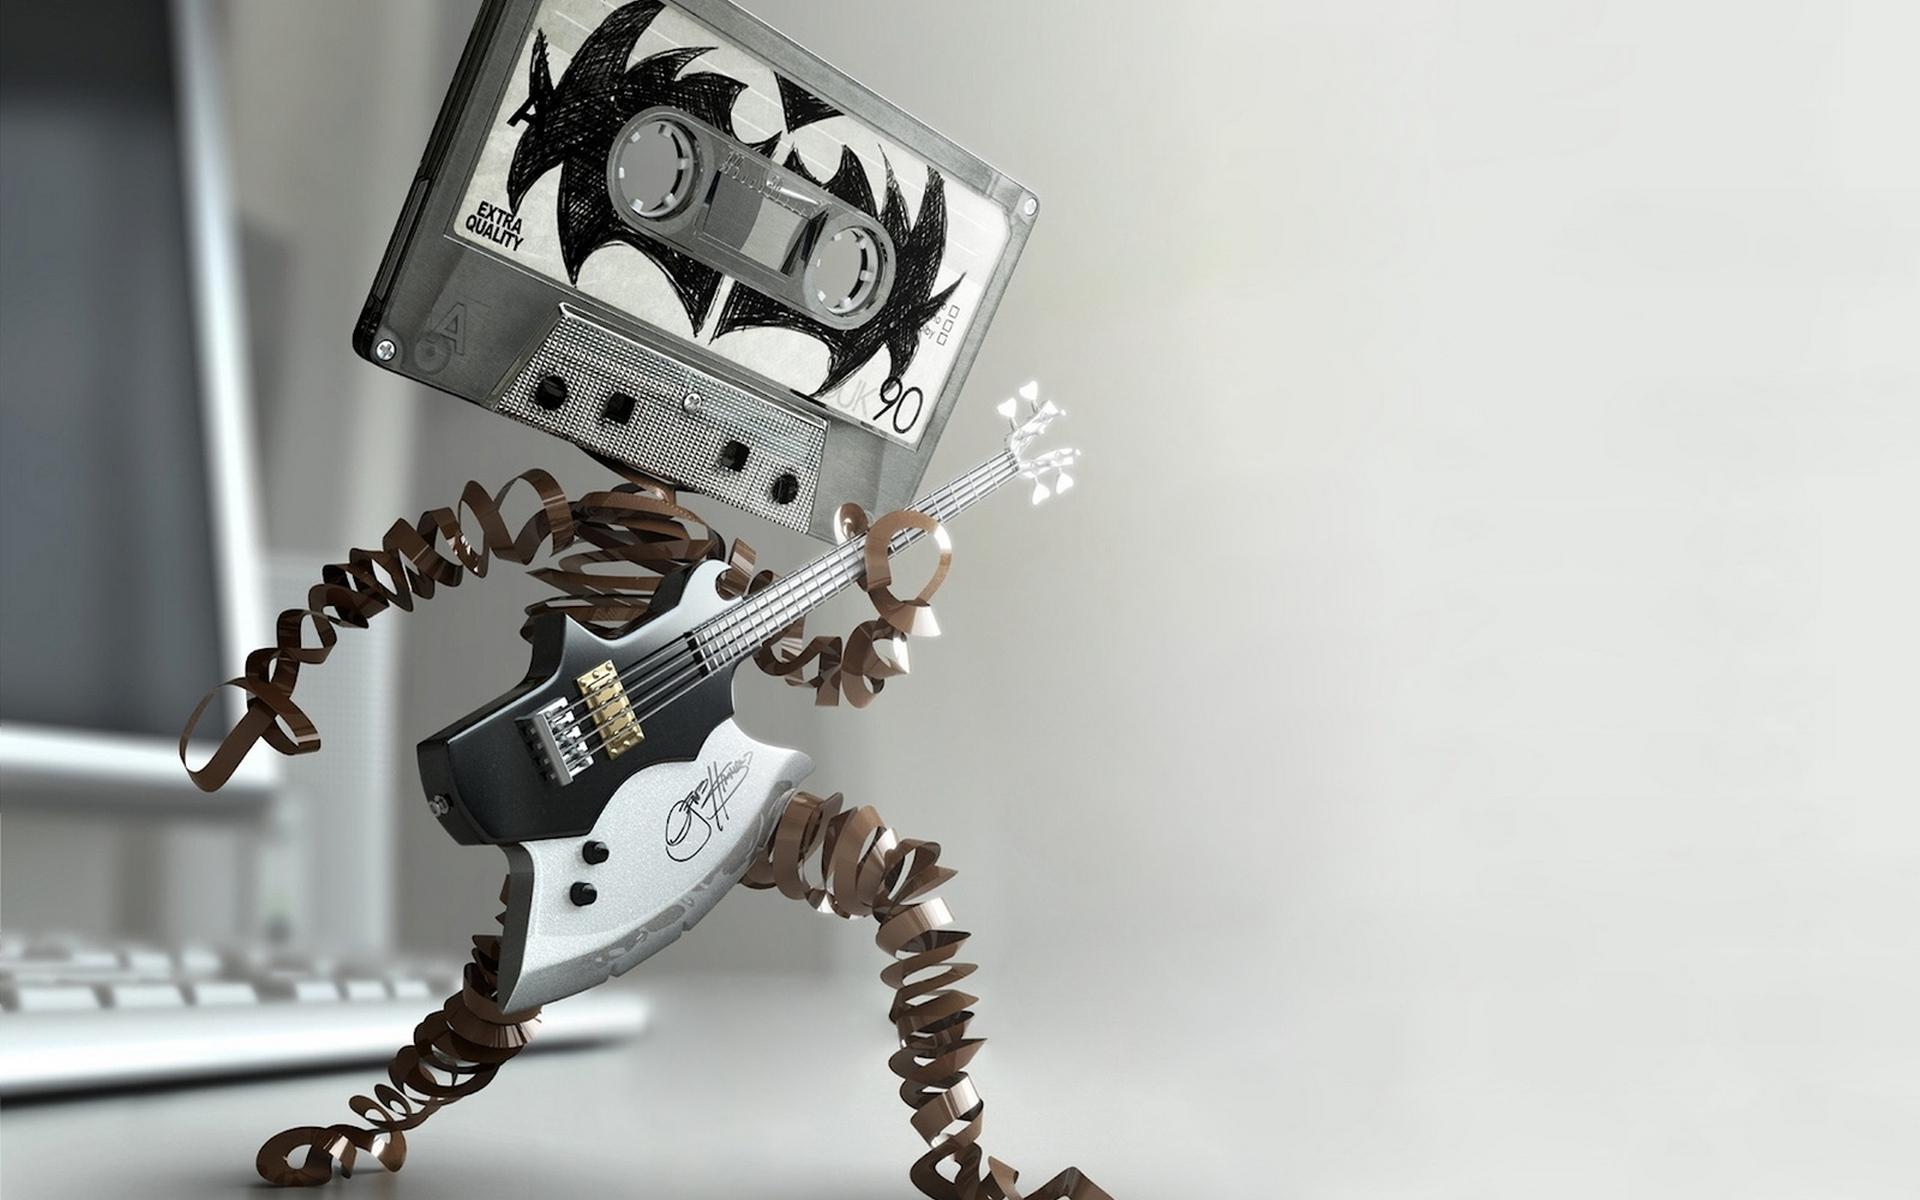 обои кассета, гитара, пленка, человек картинки фото